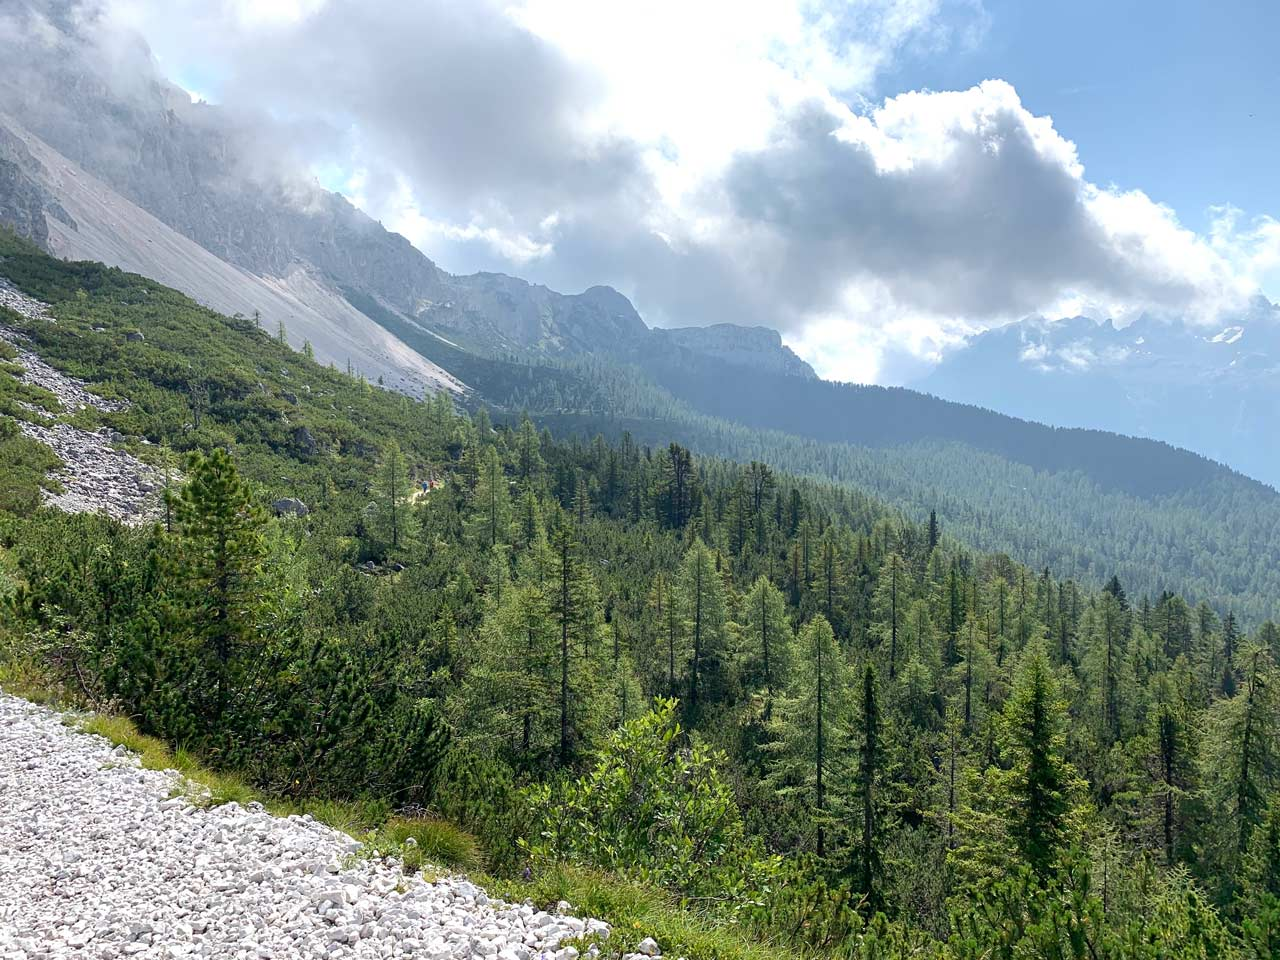 7-panorama-sentiero-misurina-col-de-varda-rifugio-citta-di-carpi